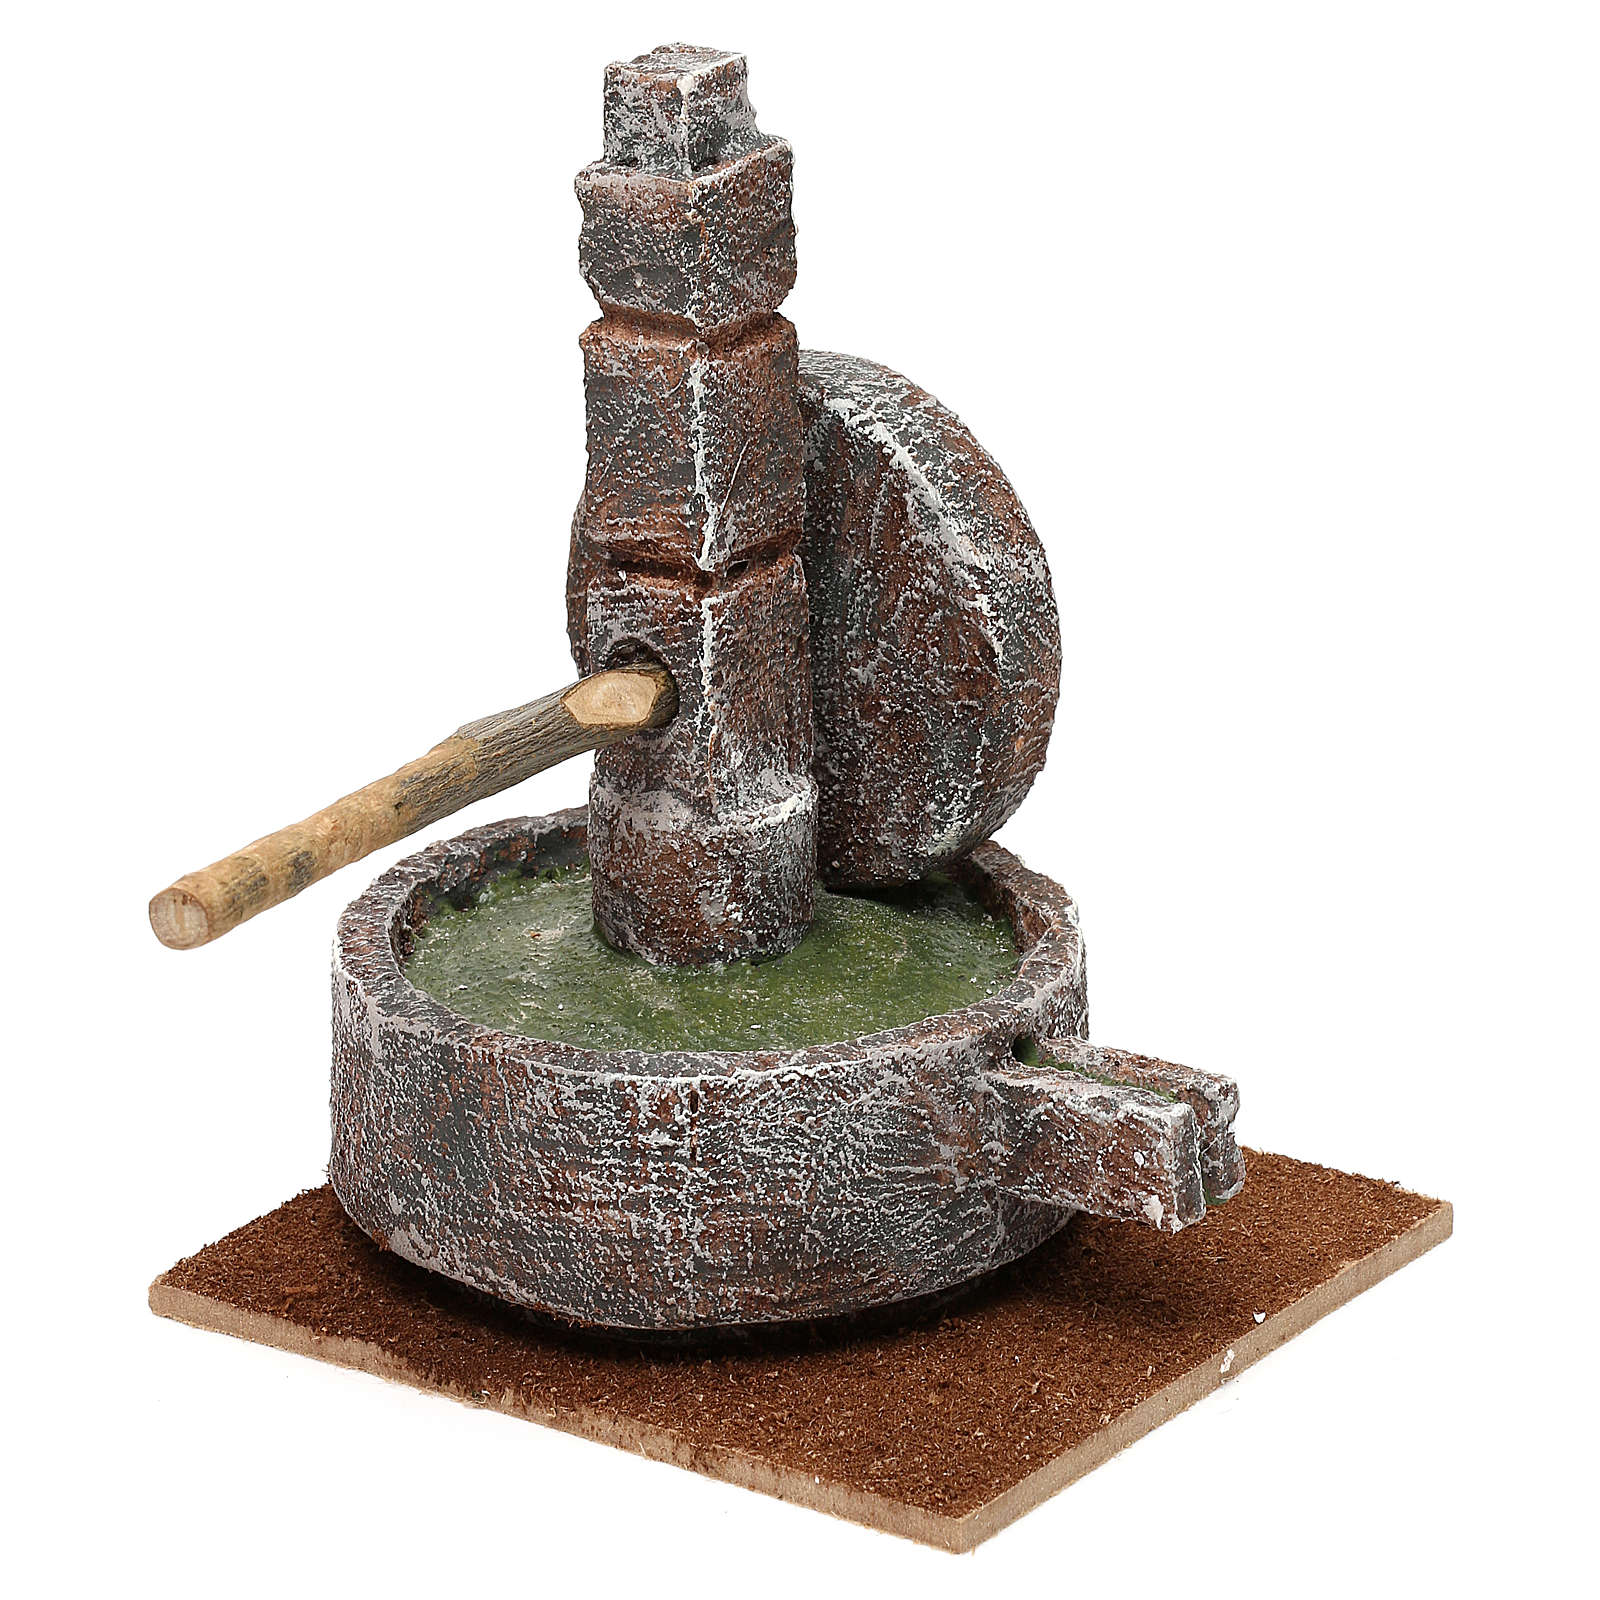 Animal millstone for 12 cm Nativity scene, 15x10x10 cm 4